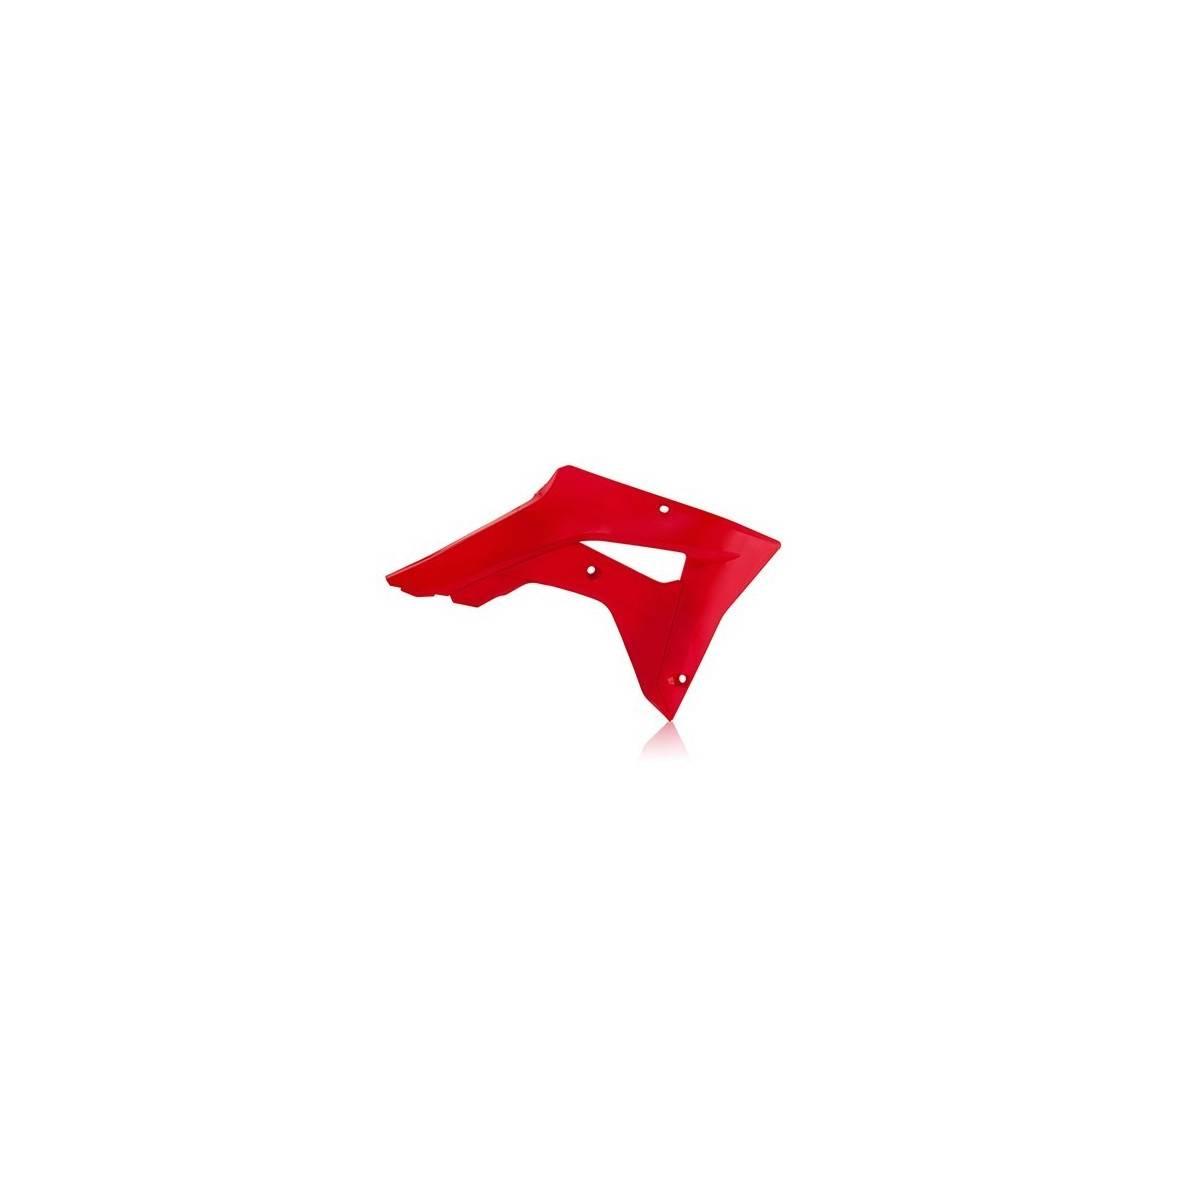 0022529-110 - Tapa Radiador Acerbis Honda Crf450Rx 17 18 Rojo